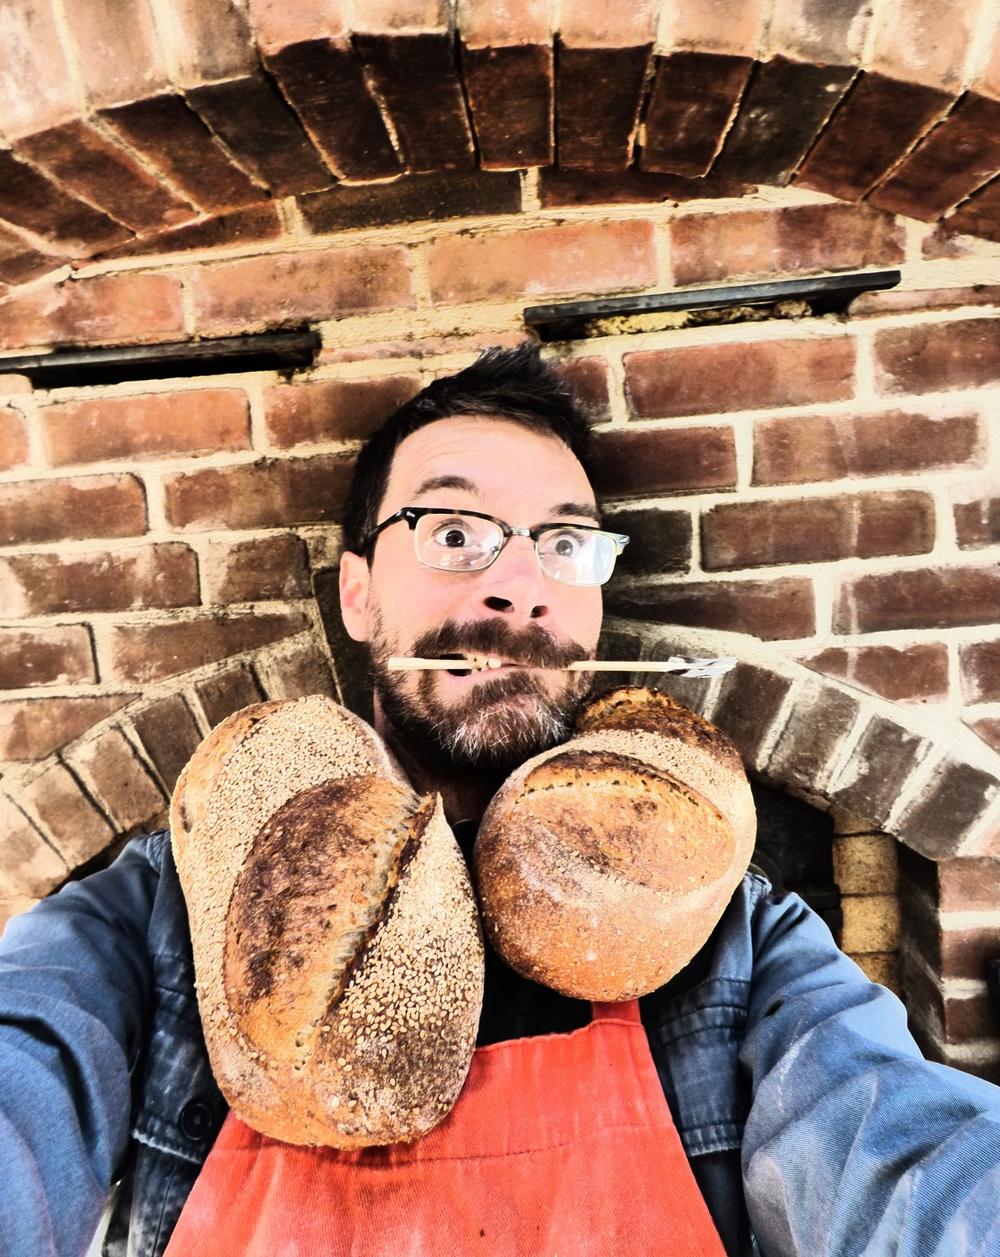 Jesse the Bakerator